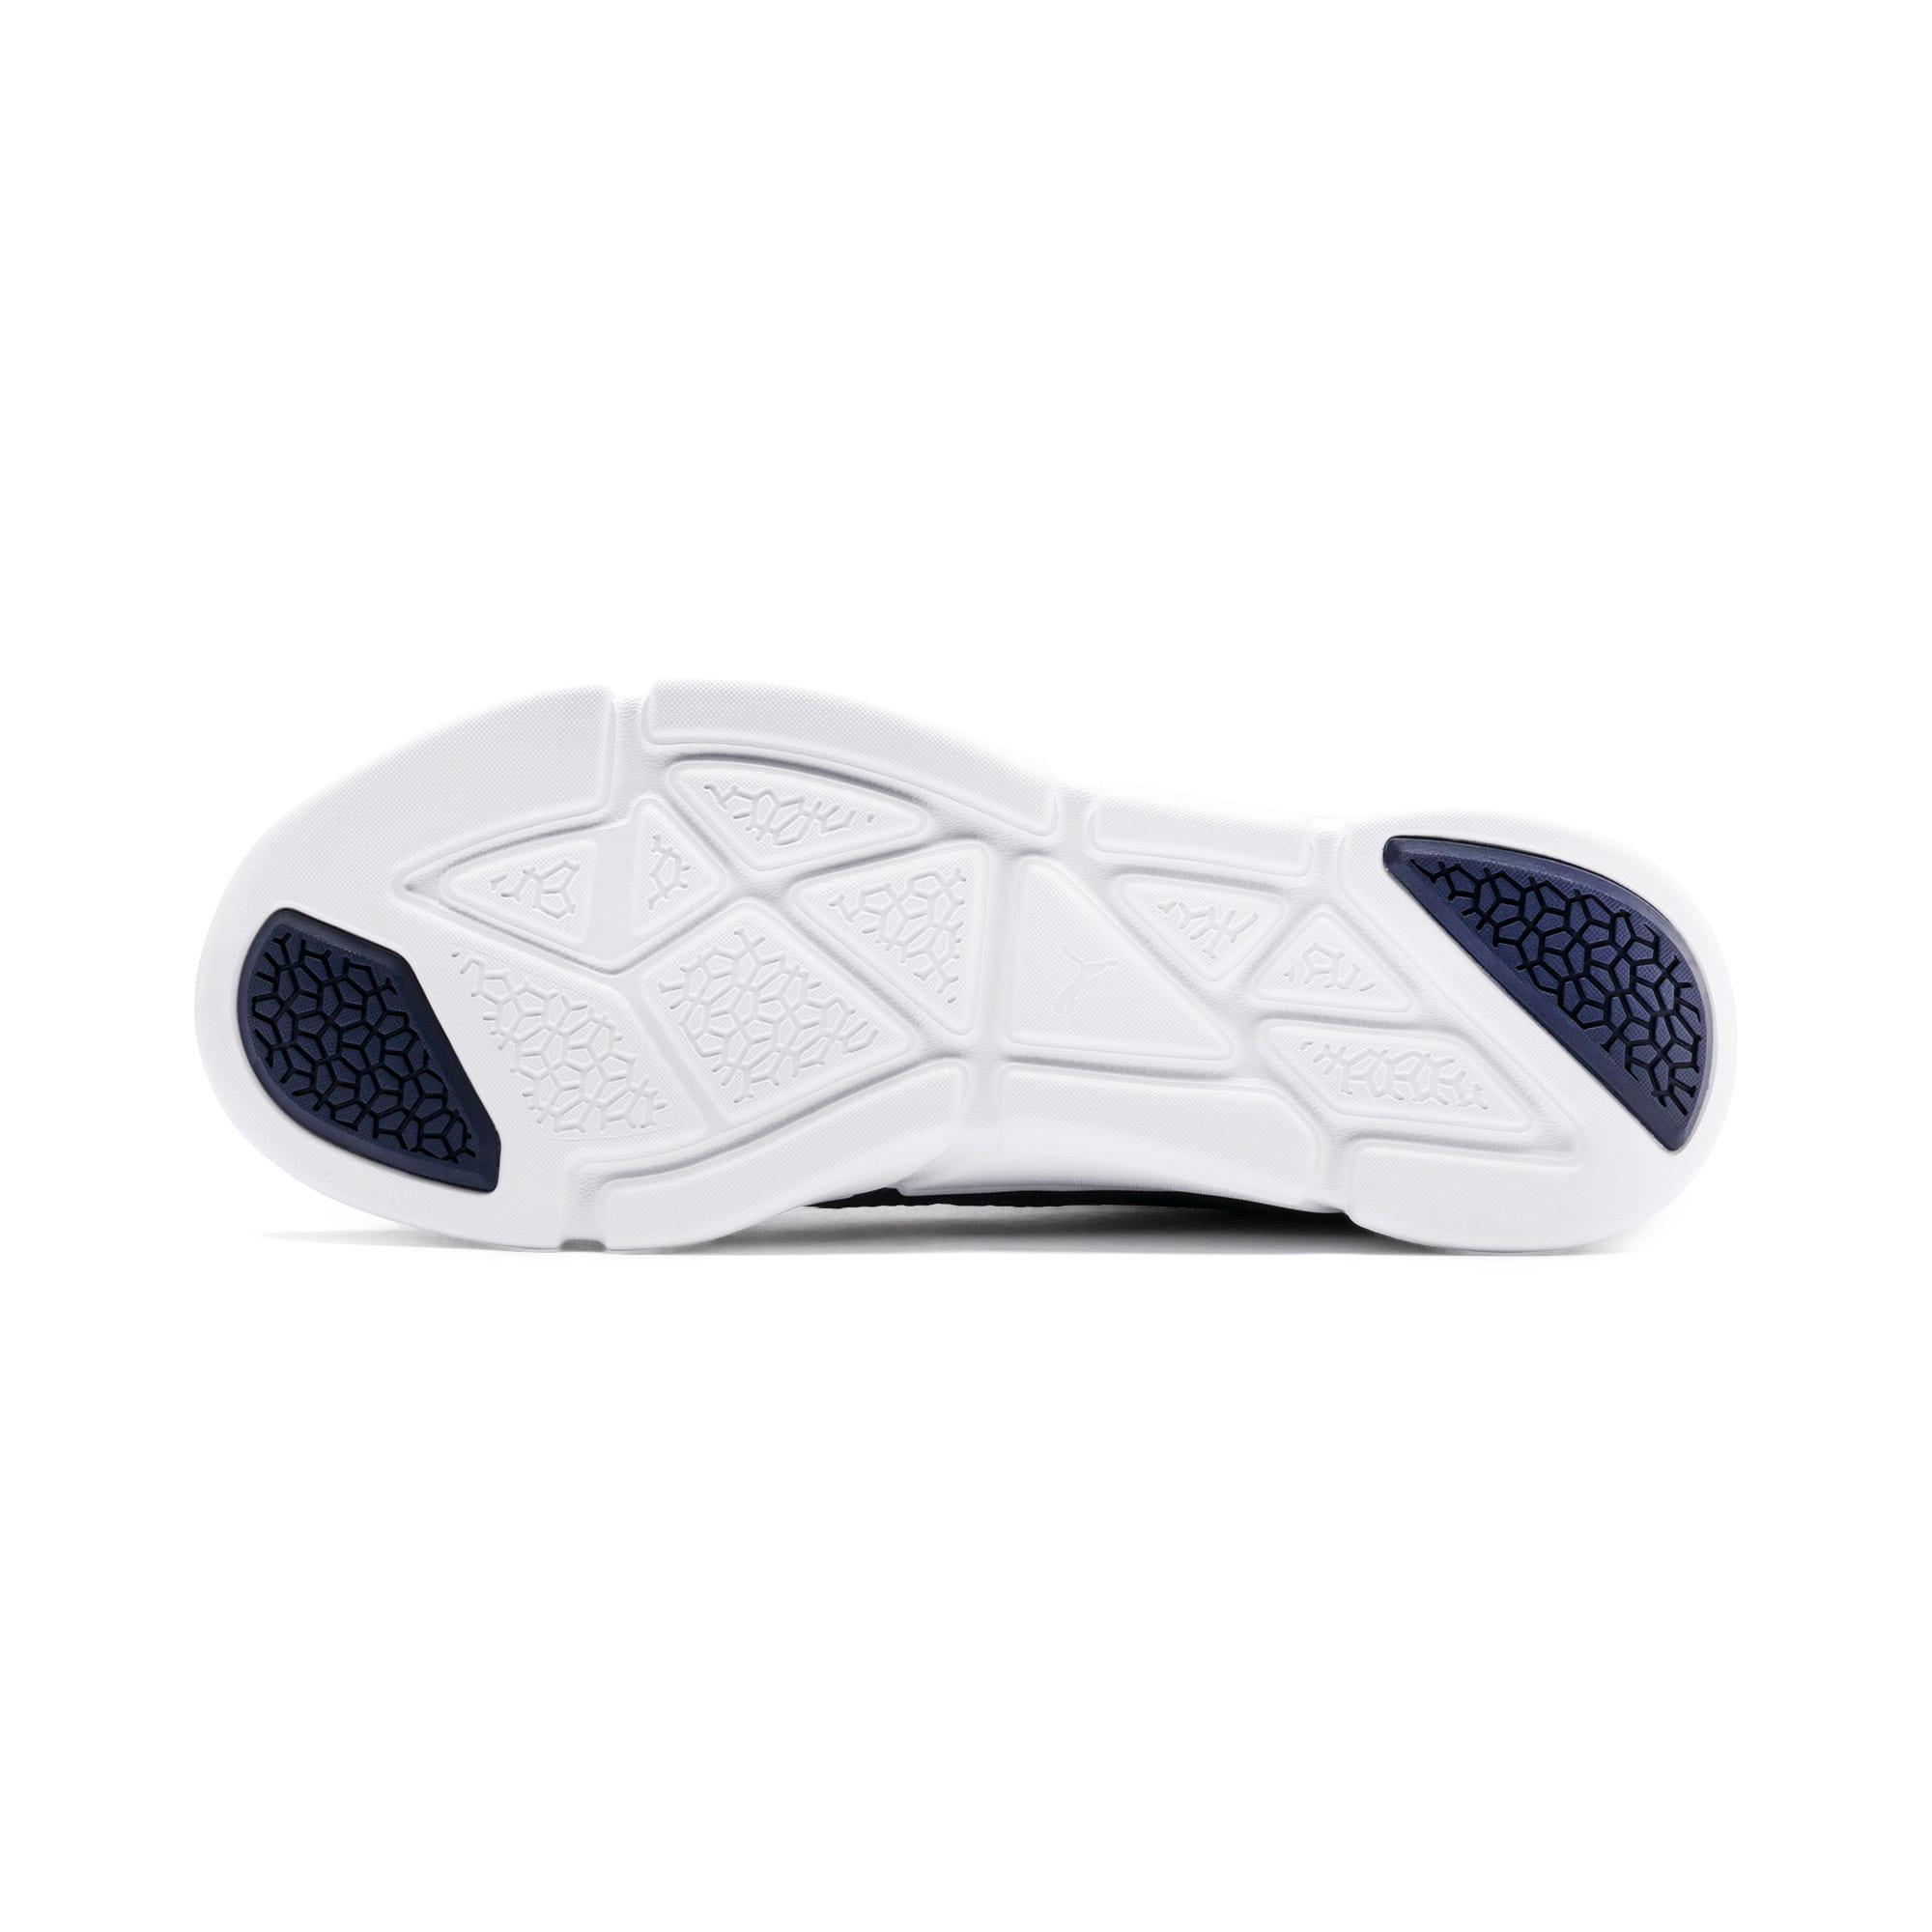 Thumbnail 6 of INTERFLEX Modern Running Shoes, Peacoat-Puma White, medium-IND